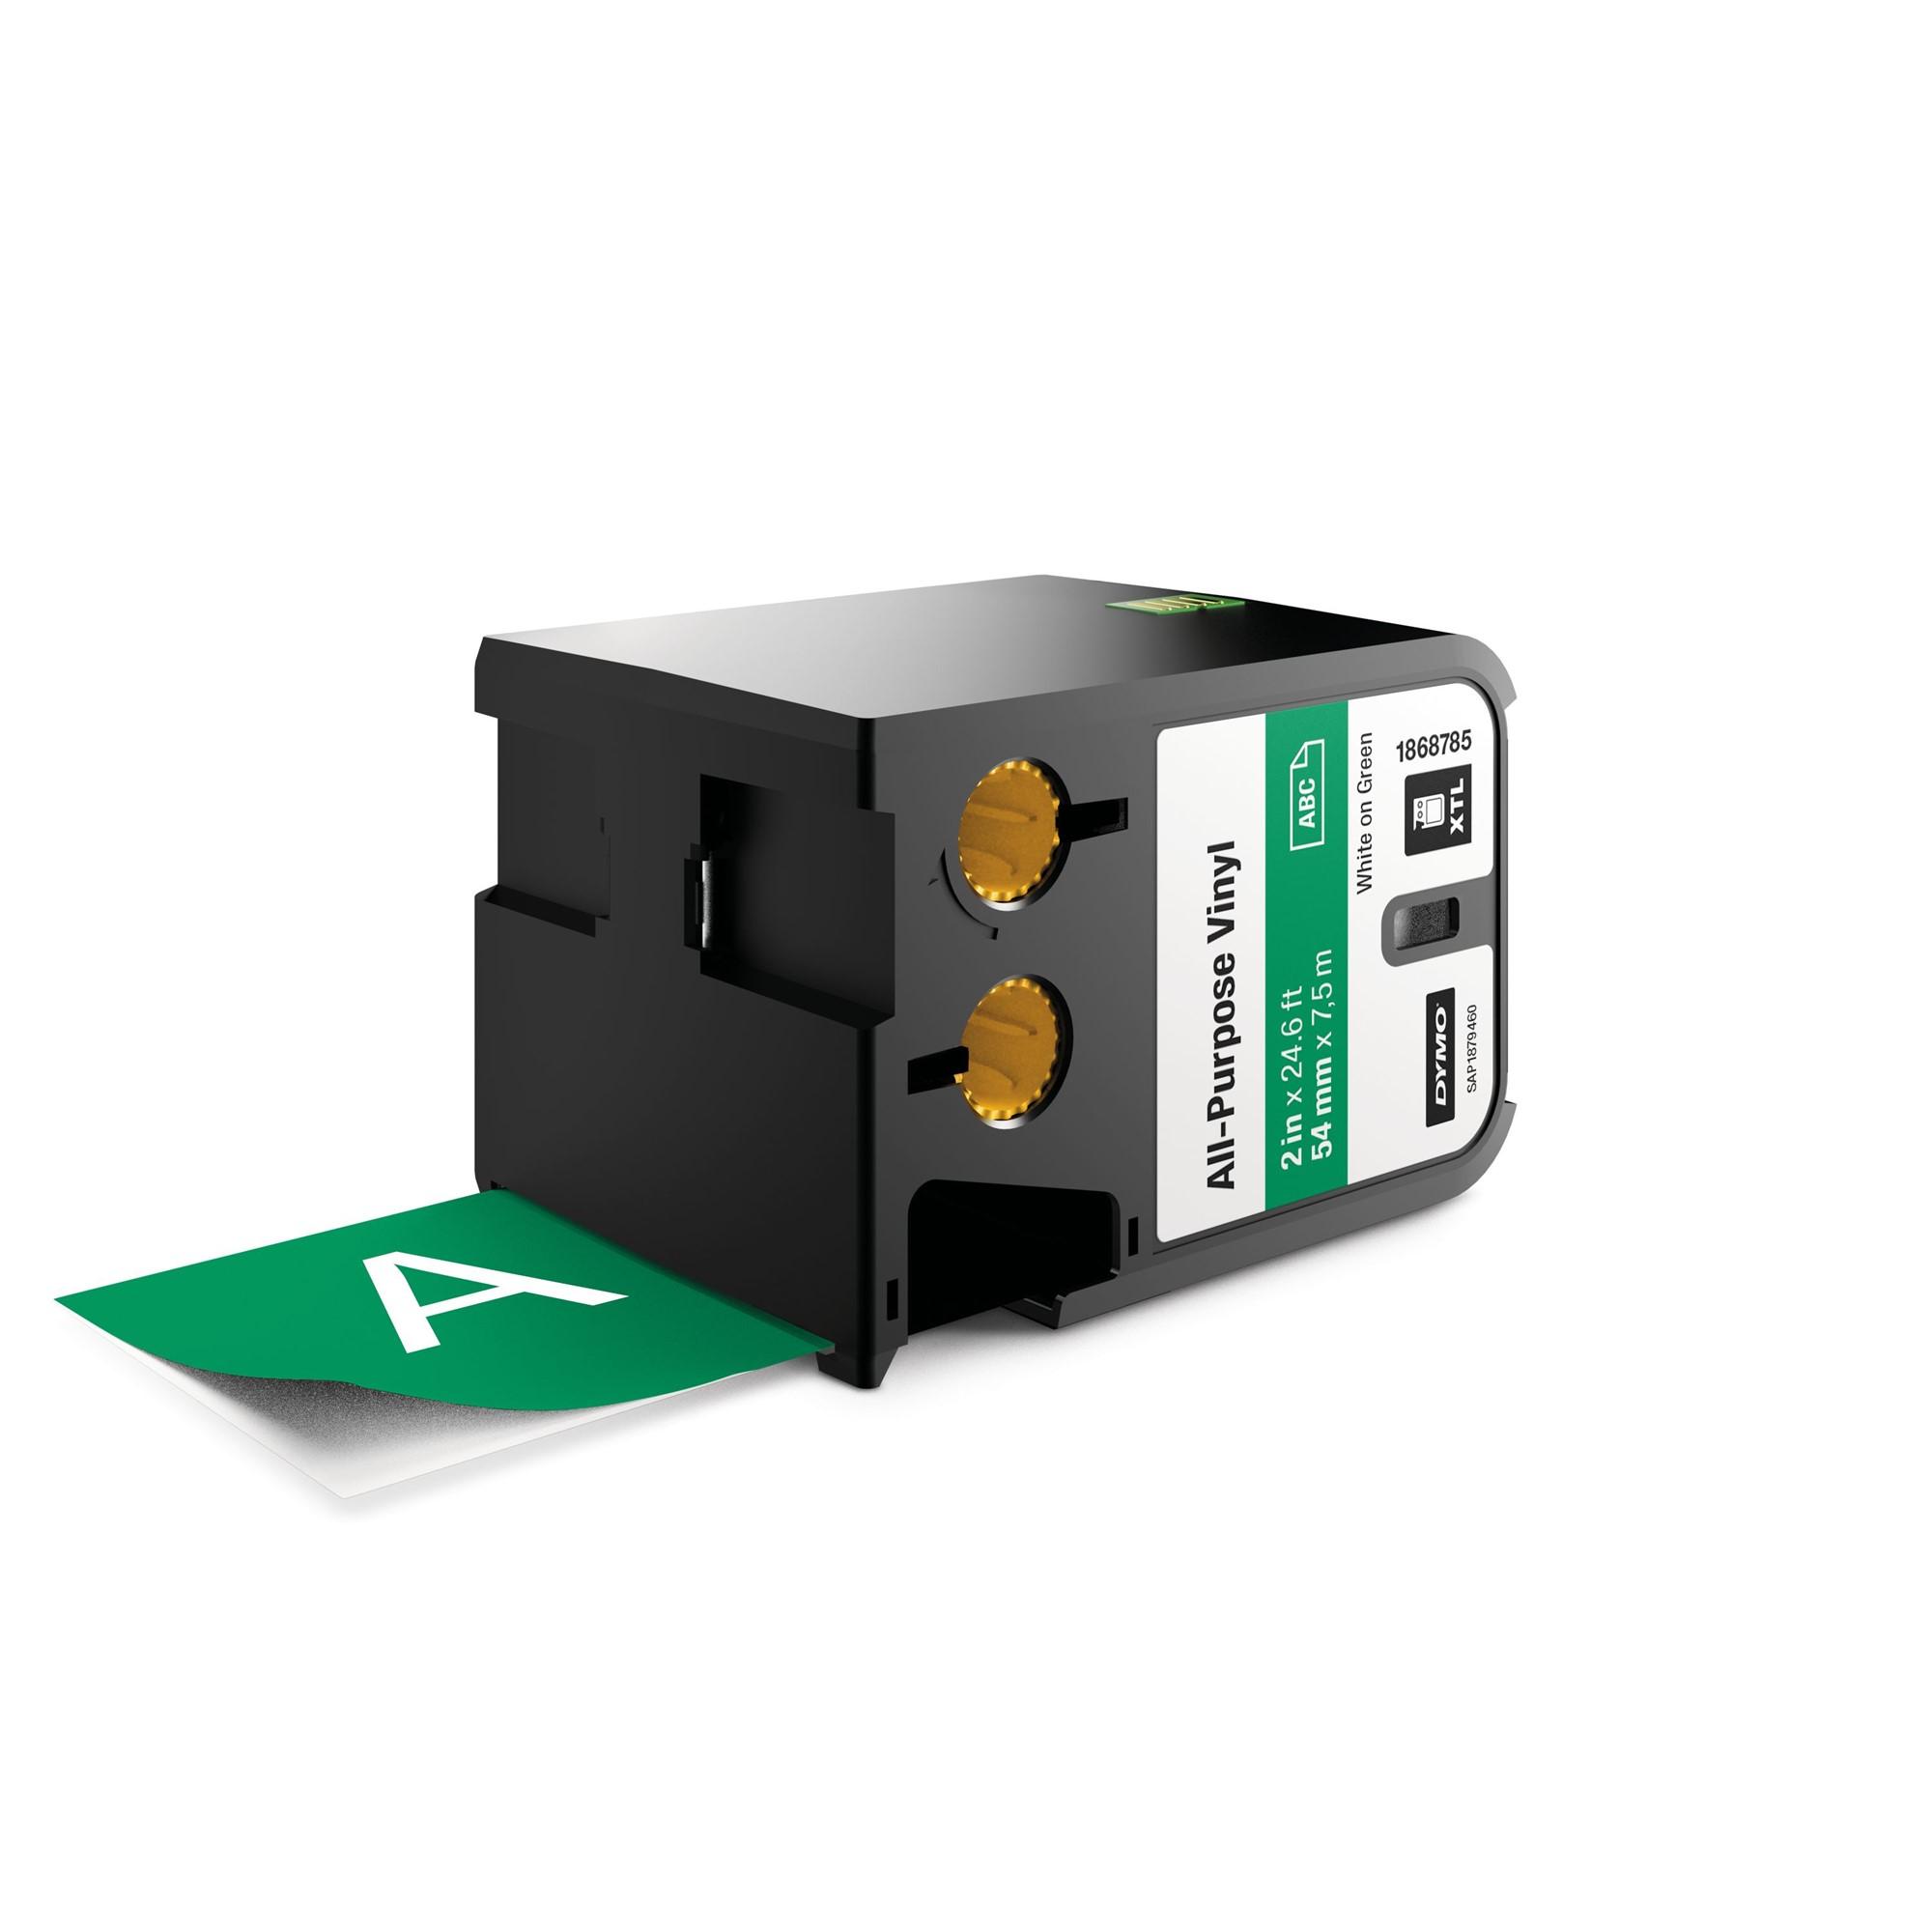 DYMO 1868785 White on green label-making tape